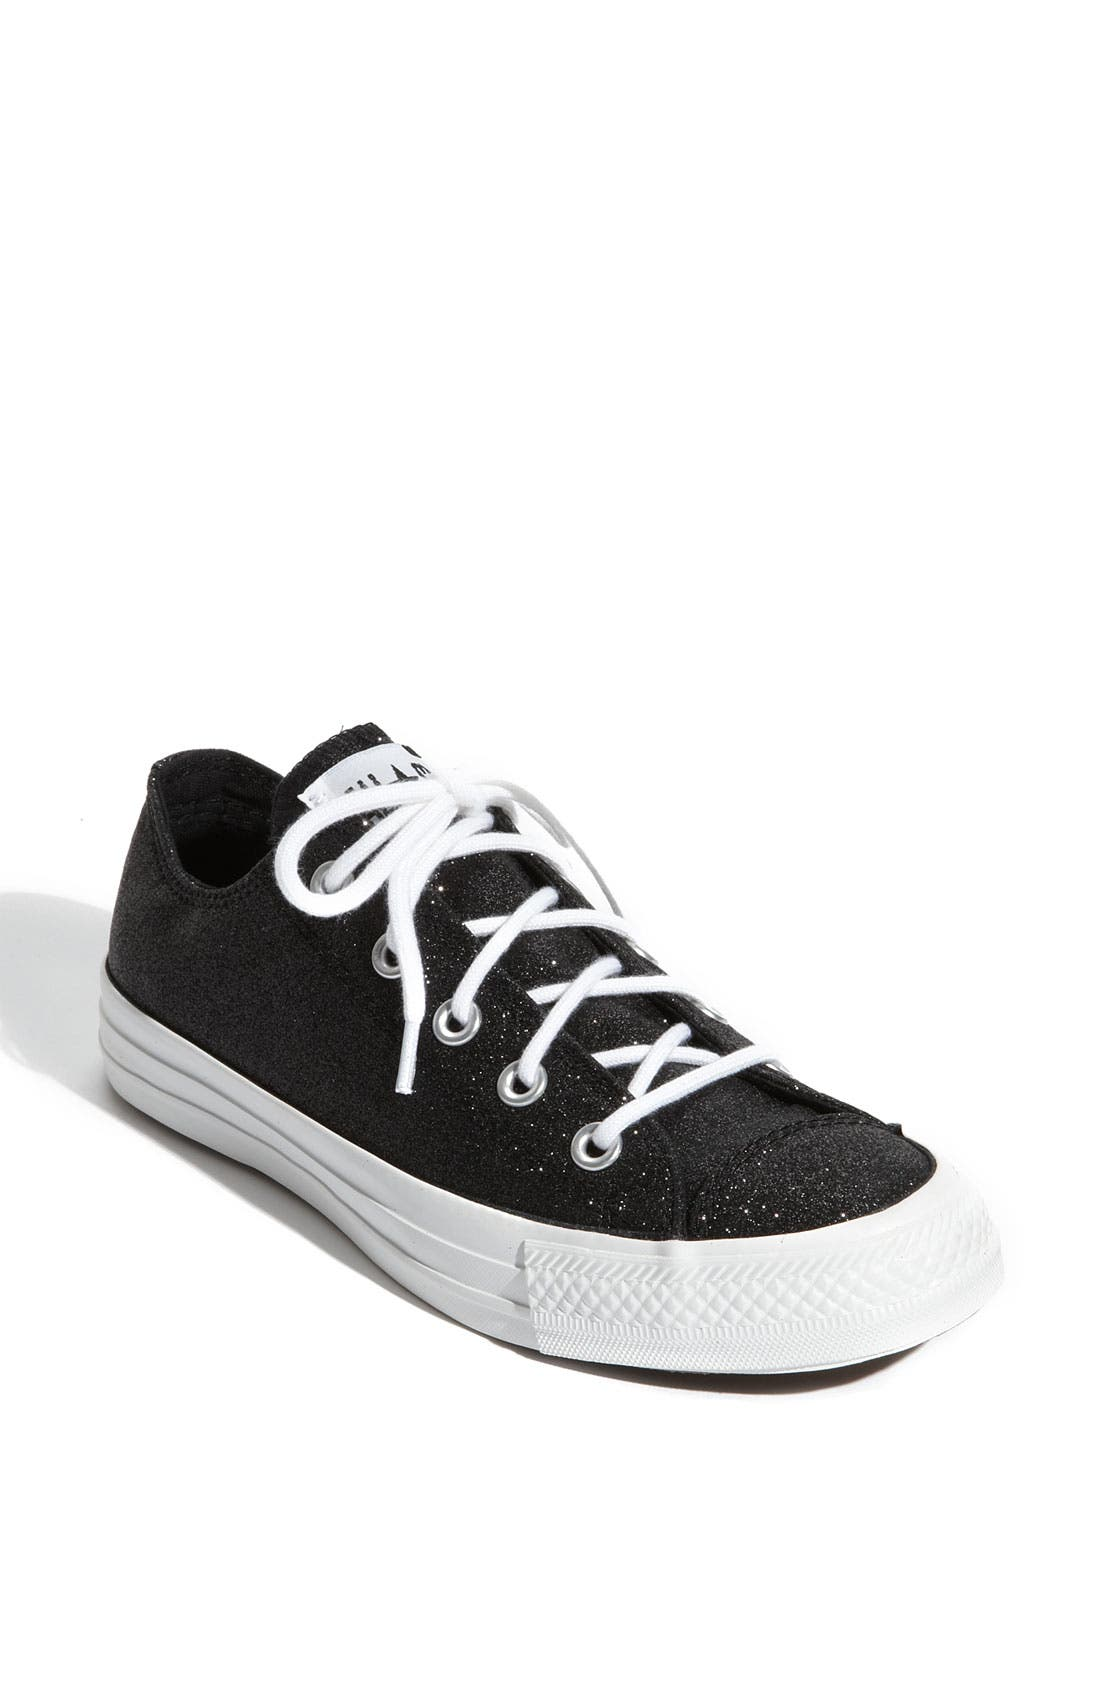 Main Image - Converse Chuck Taylor® 'Winter Glitz' Sneaker